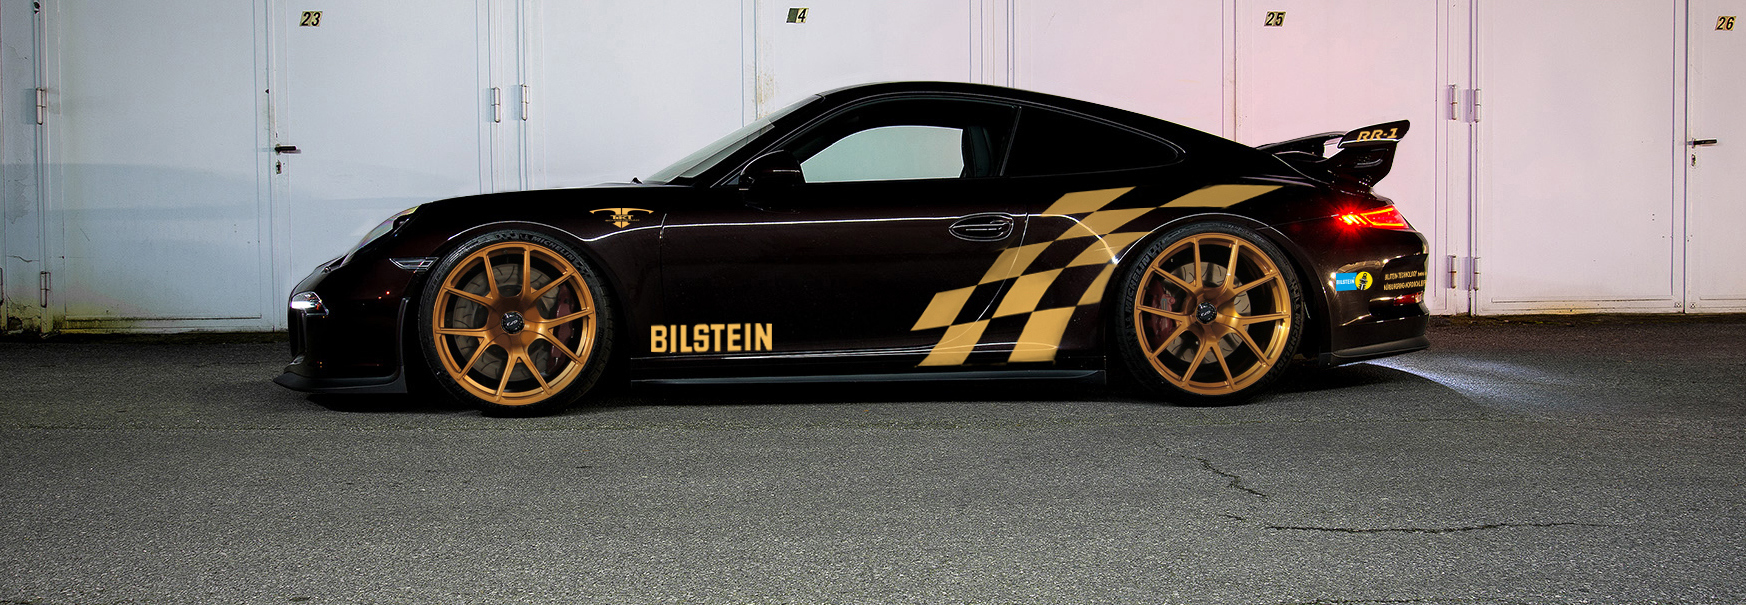 Porsche 991 with sport suspension bilstein better racetrack site for football betting tips